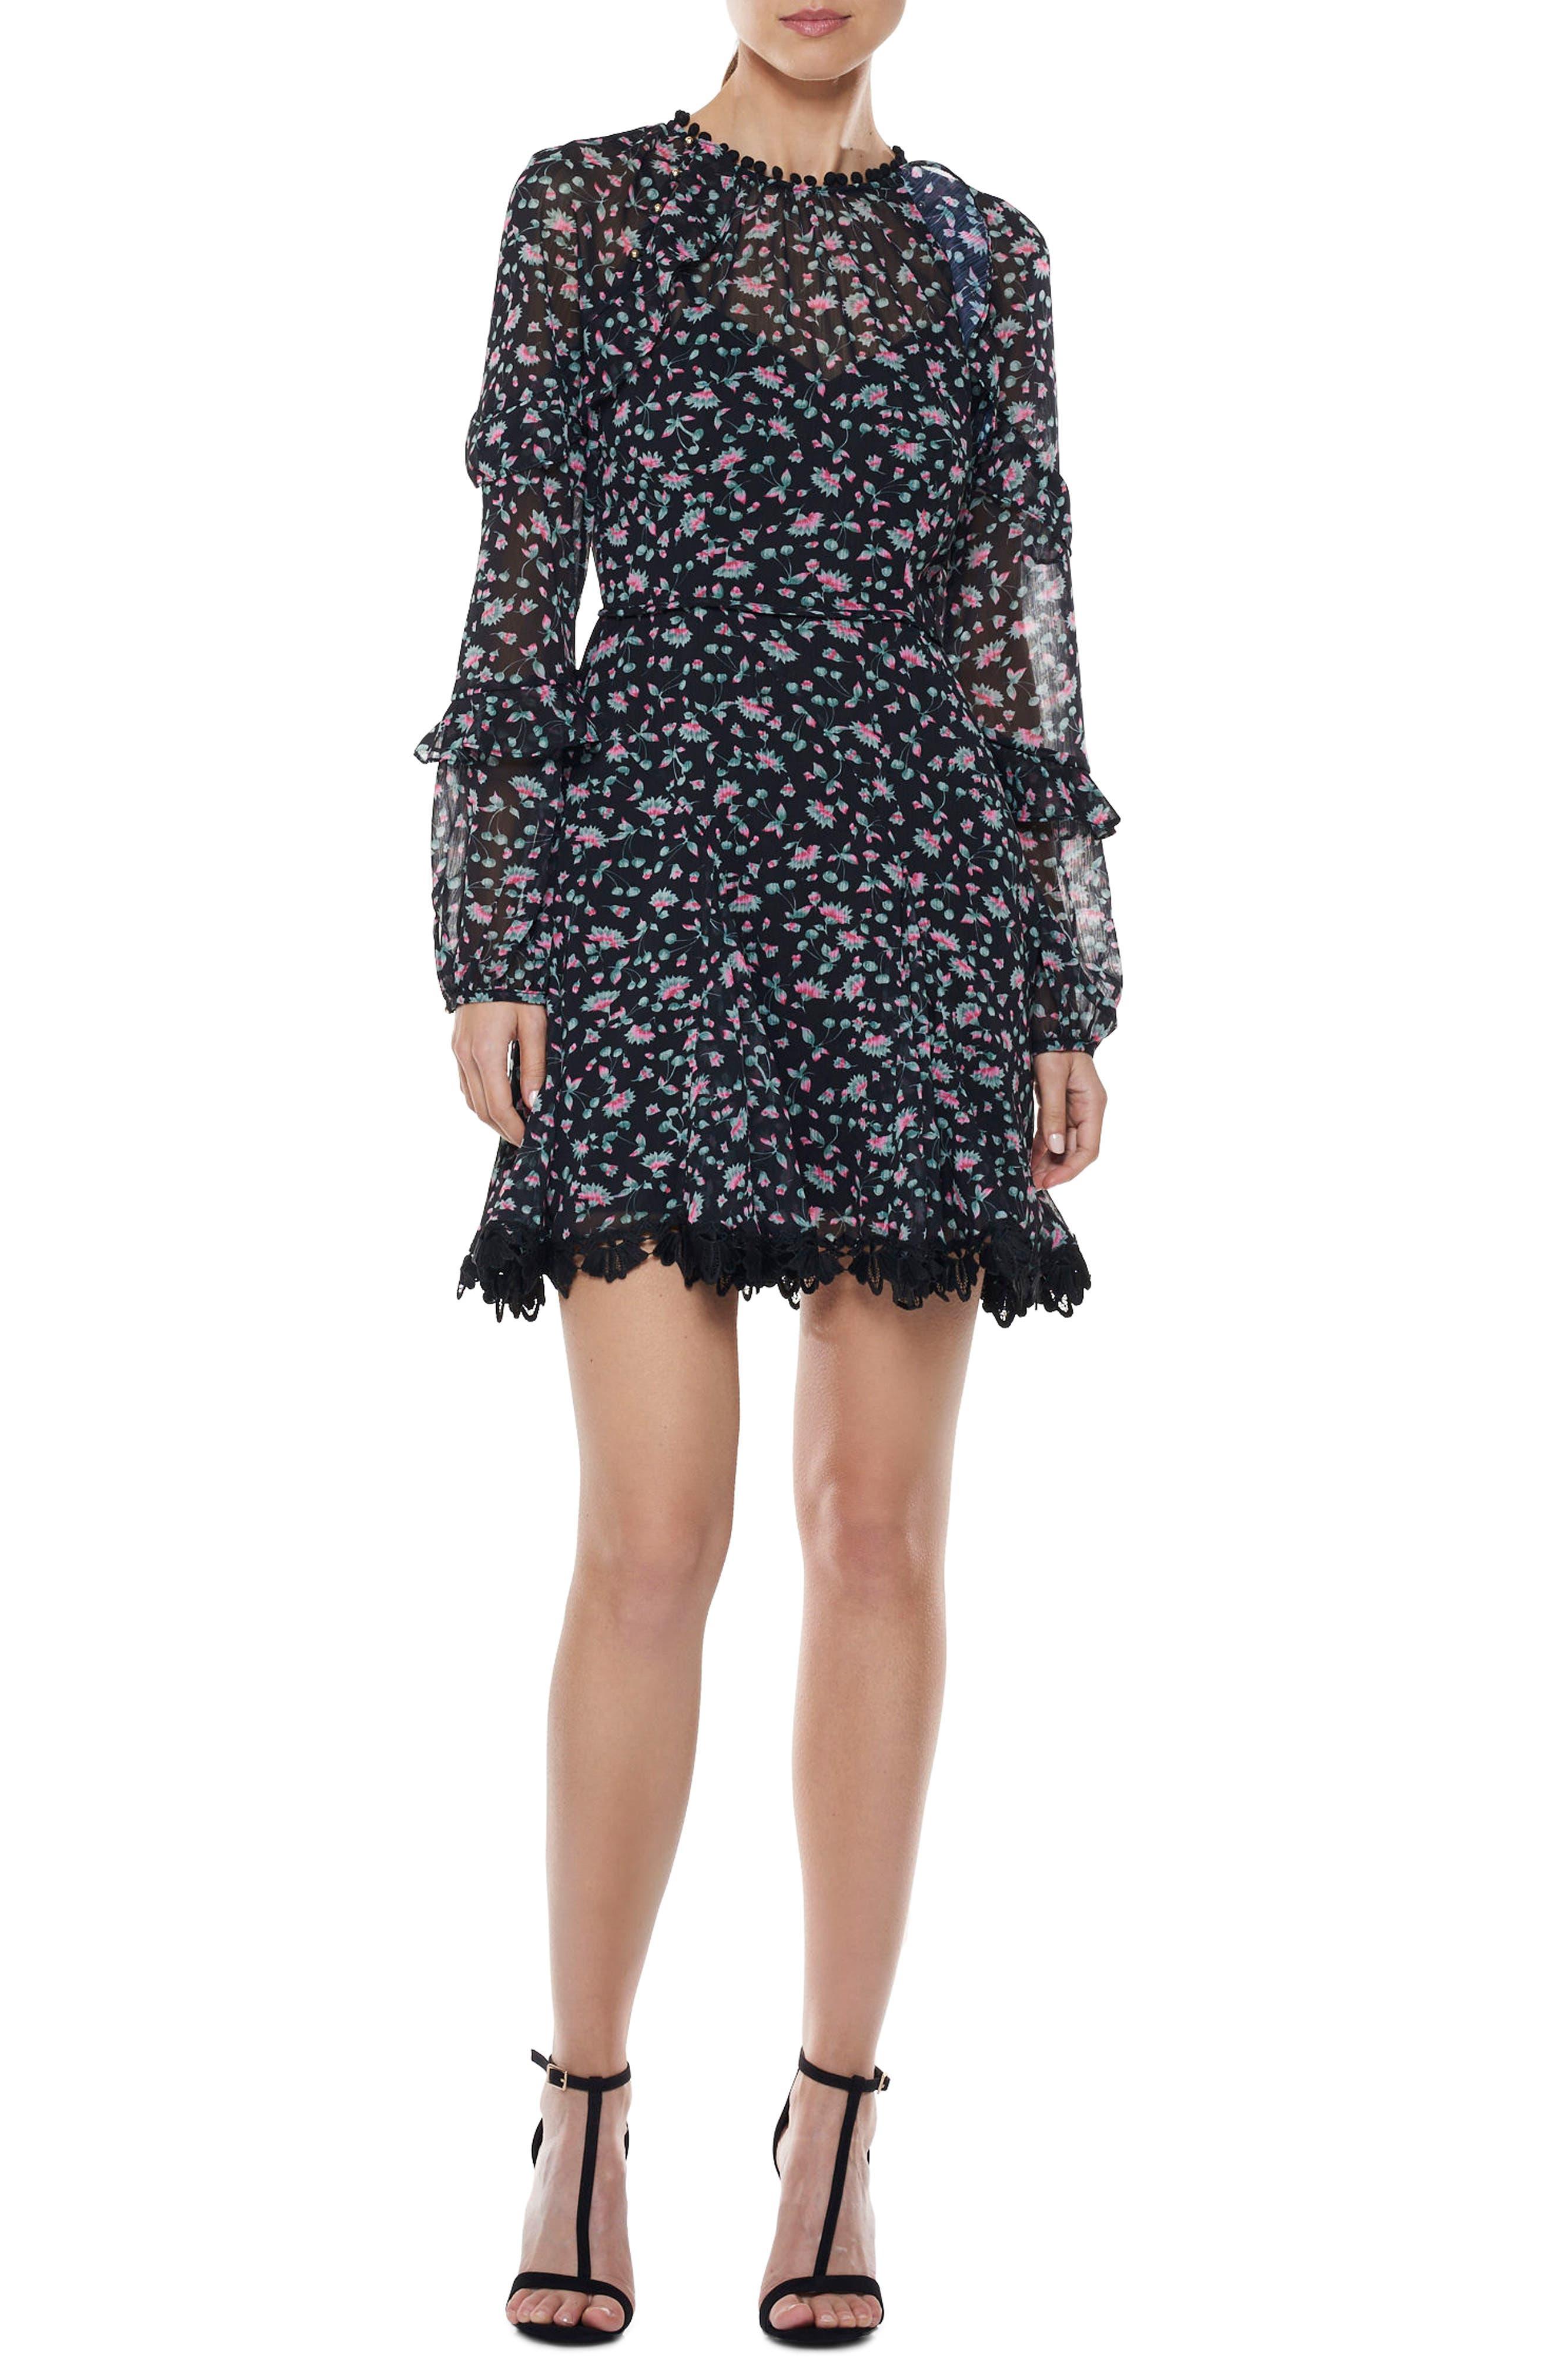 LA MAISON TALULAH Unwavering Glamour Ruffle Minidress, Main, color, 001